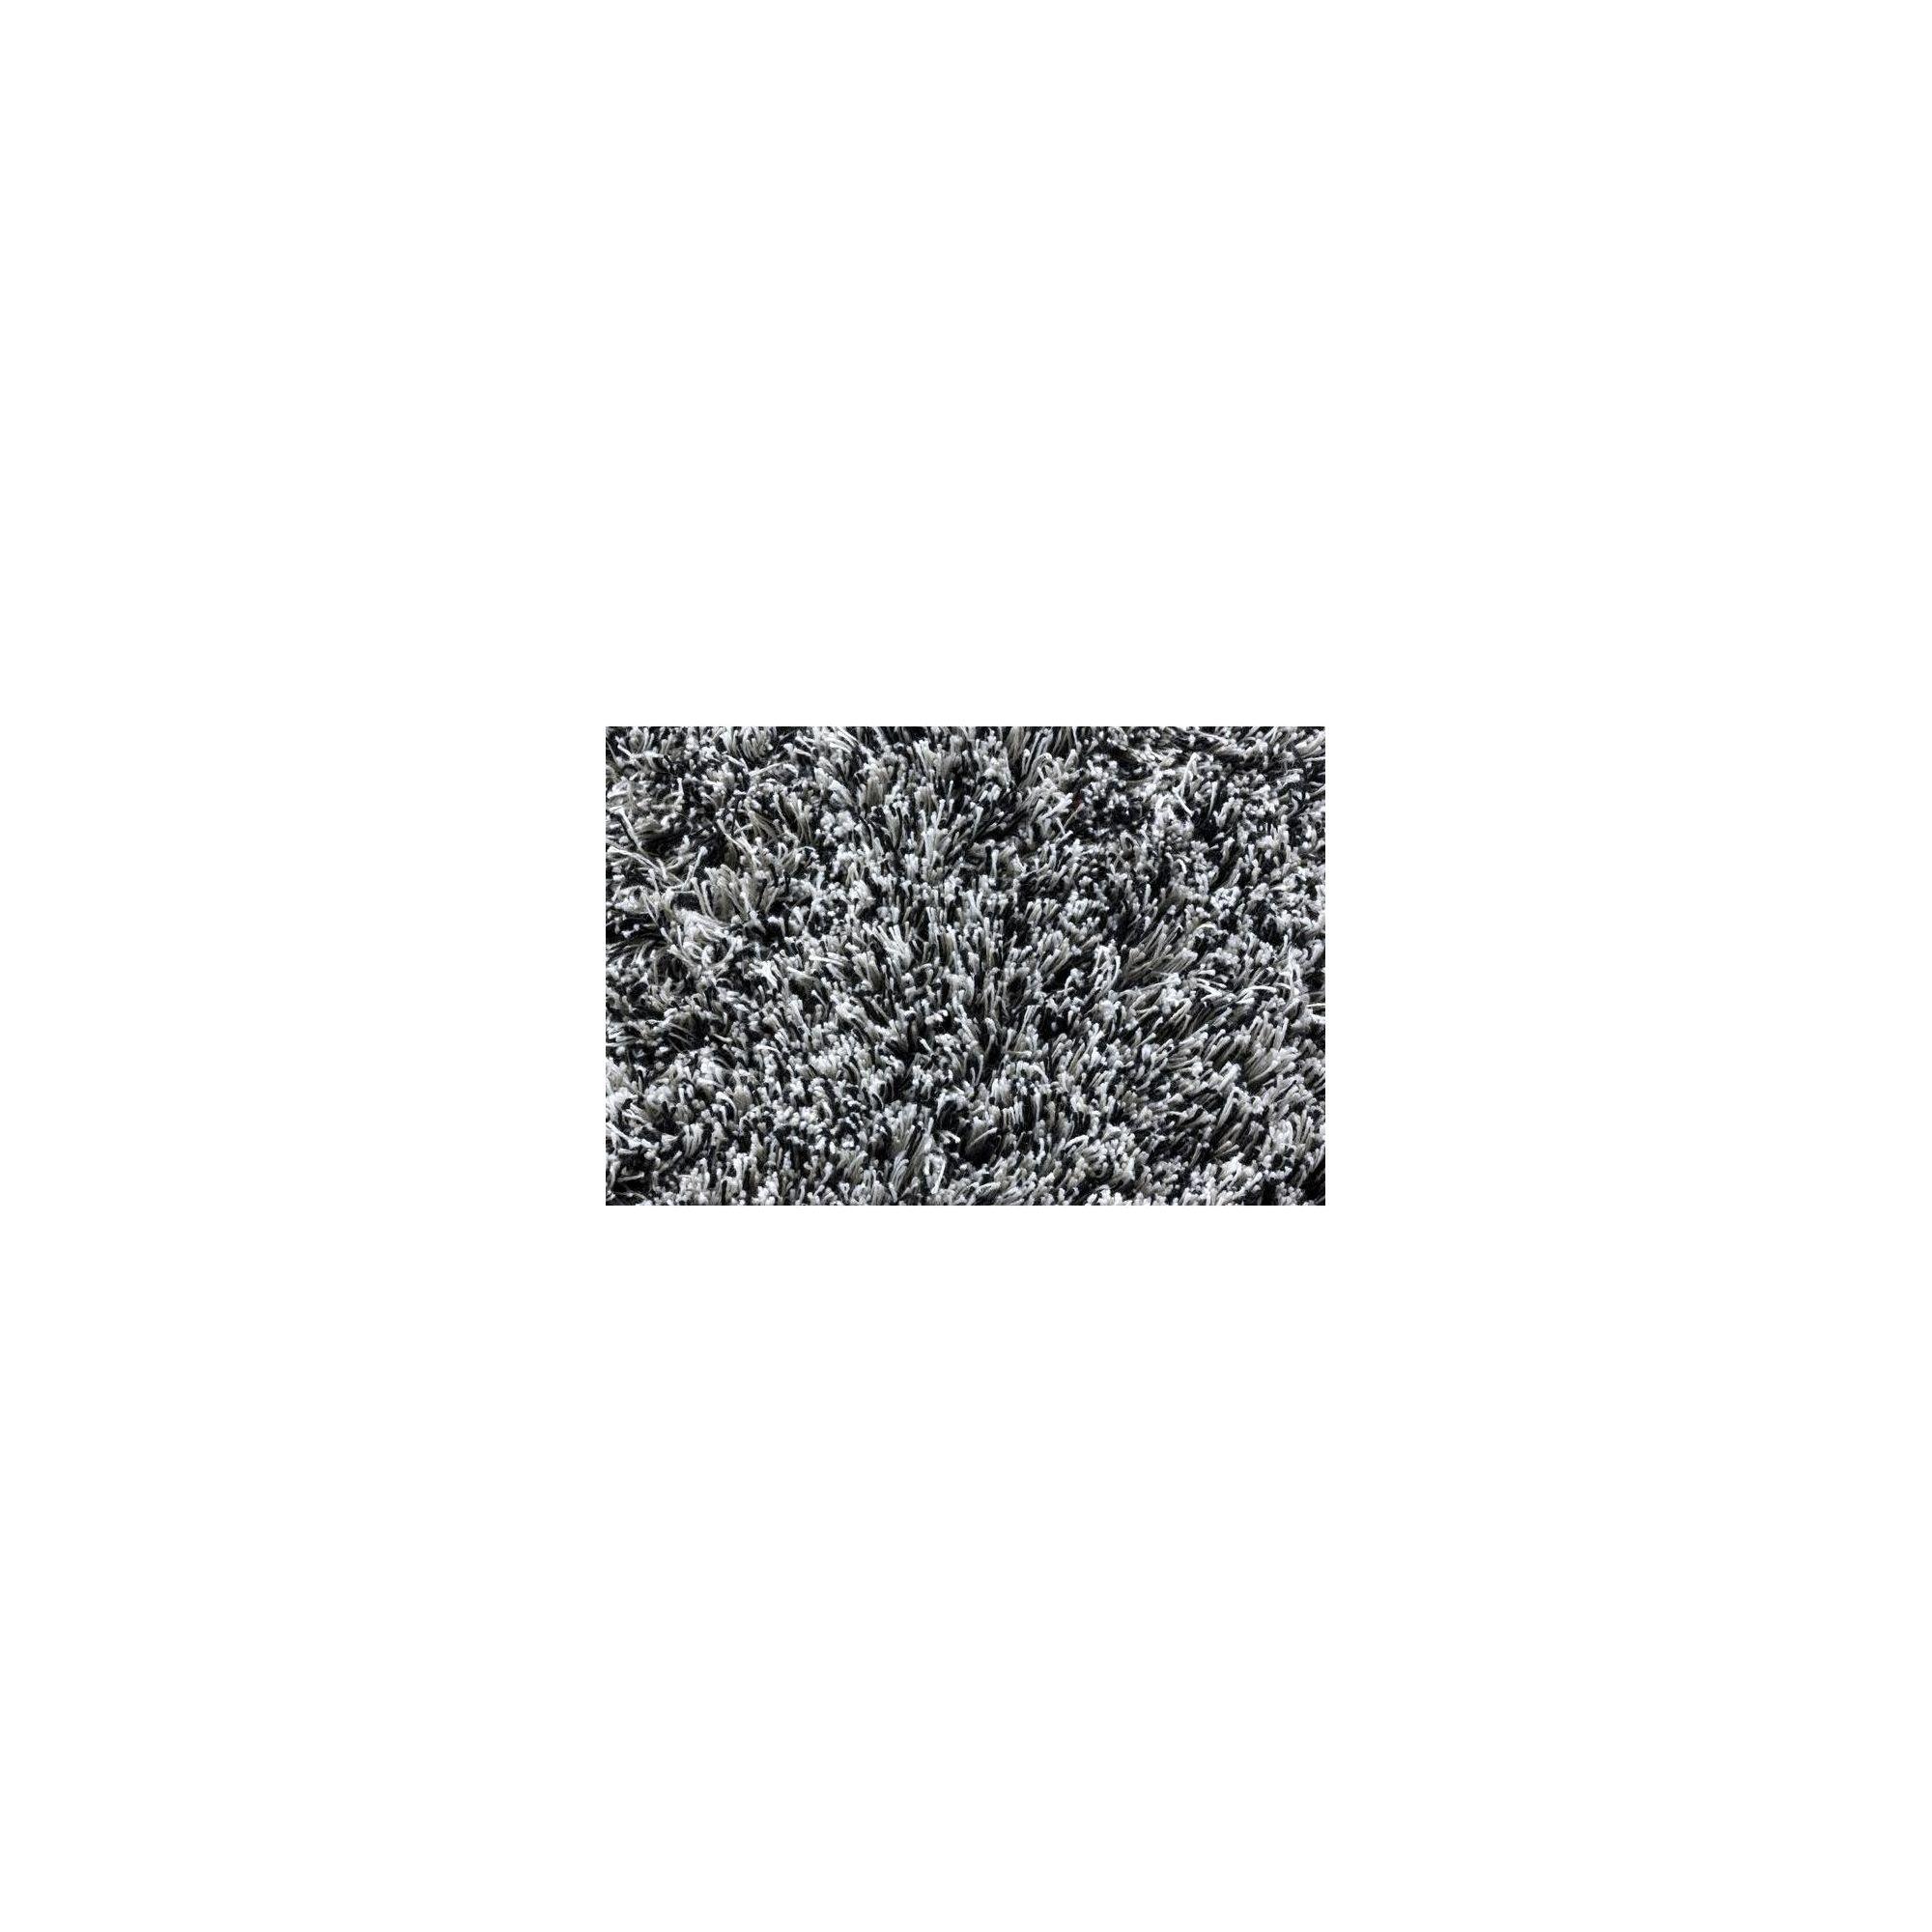 Linie Design Timeless Black Shag Rug - 300cm x 200cm at Tesco Direct